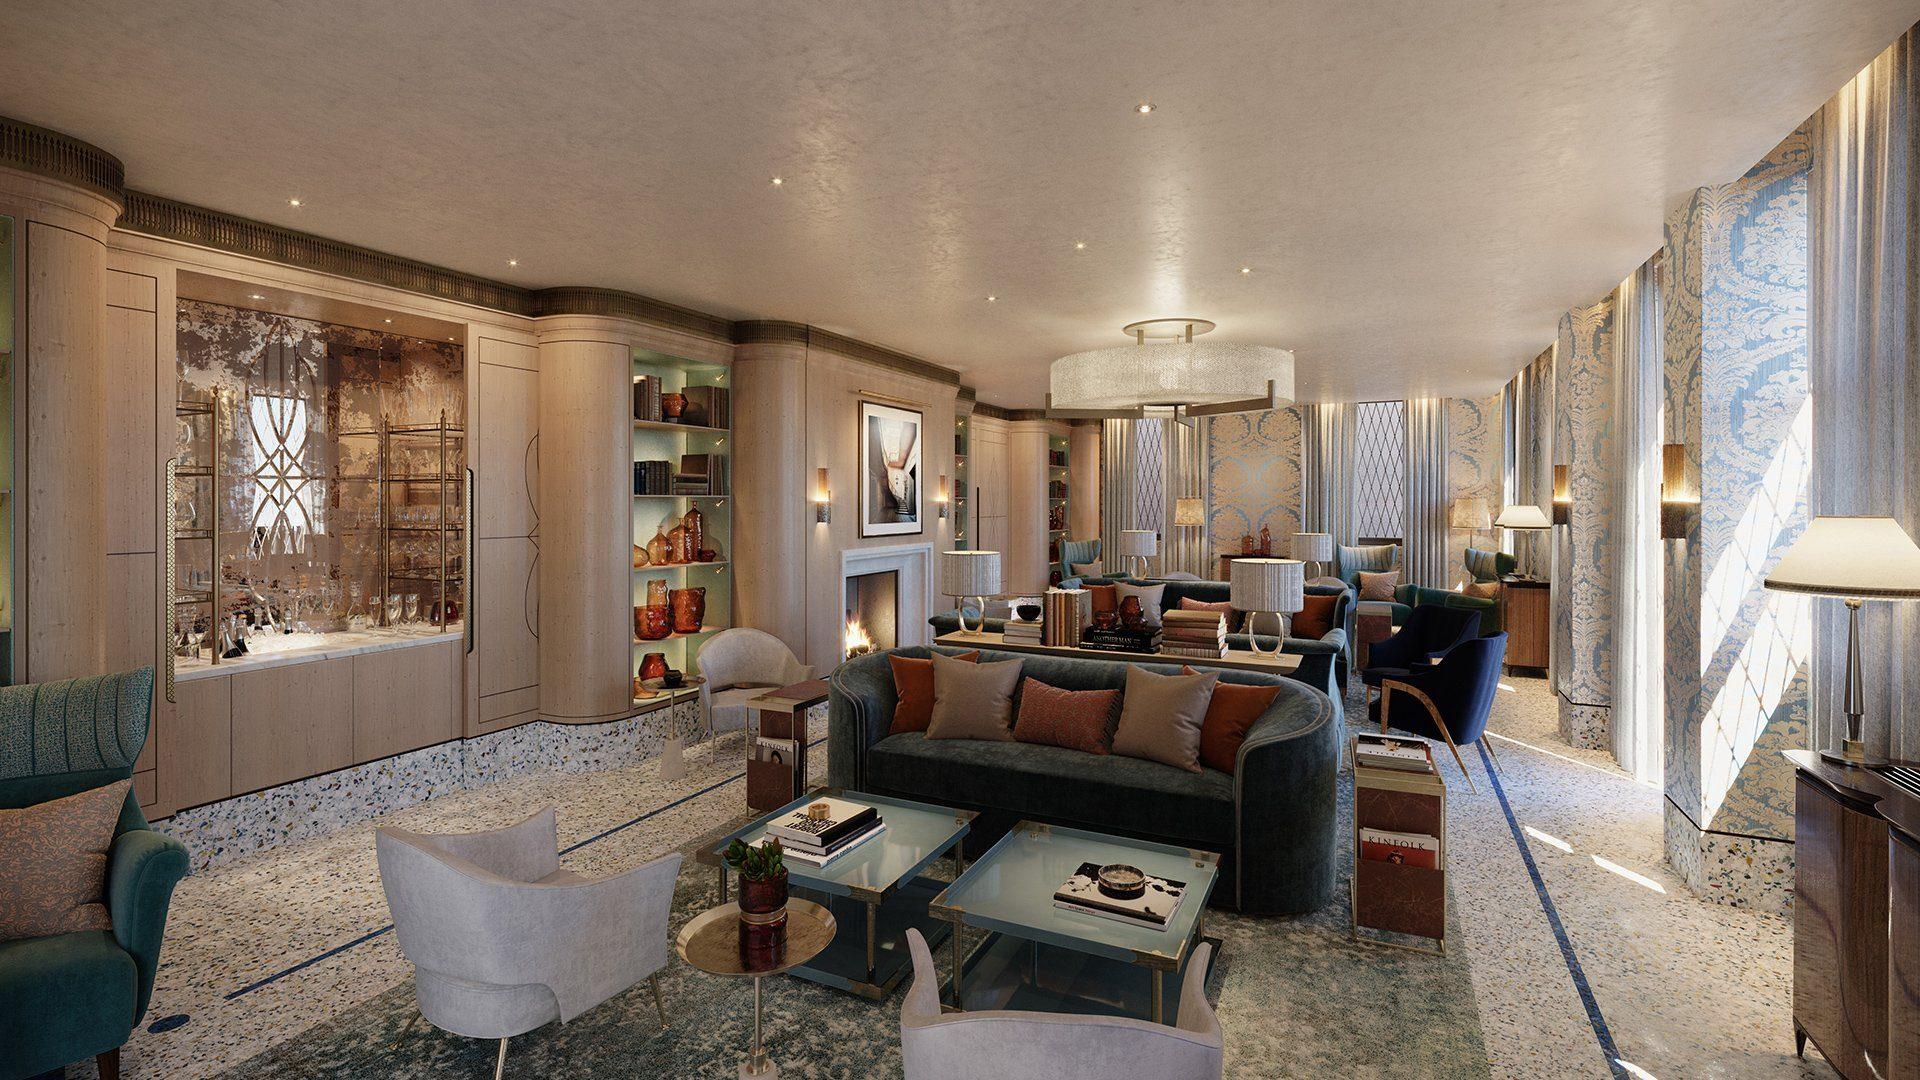 The St. Regis Venice lounge